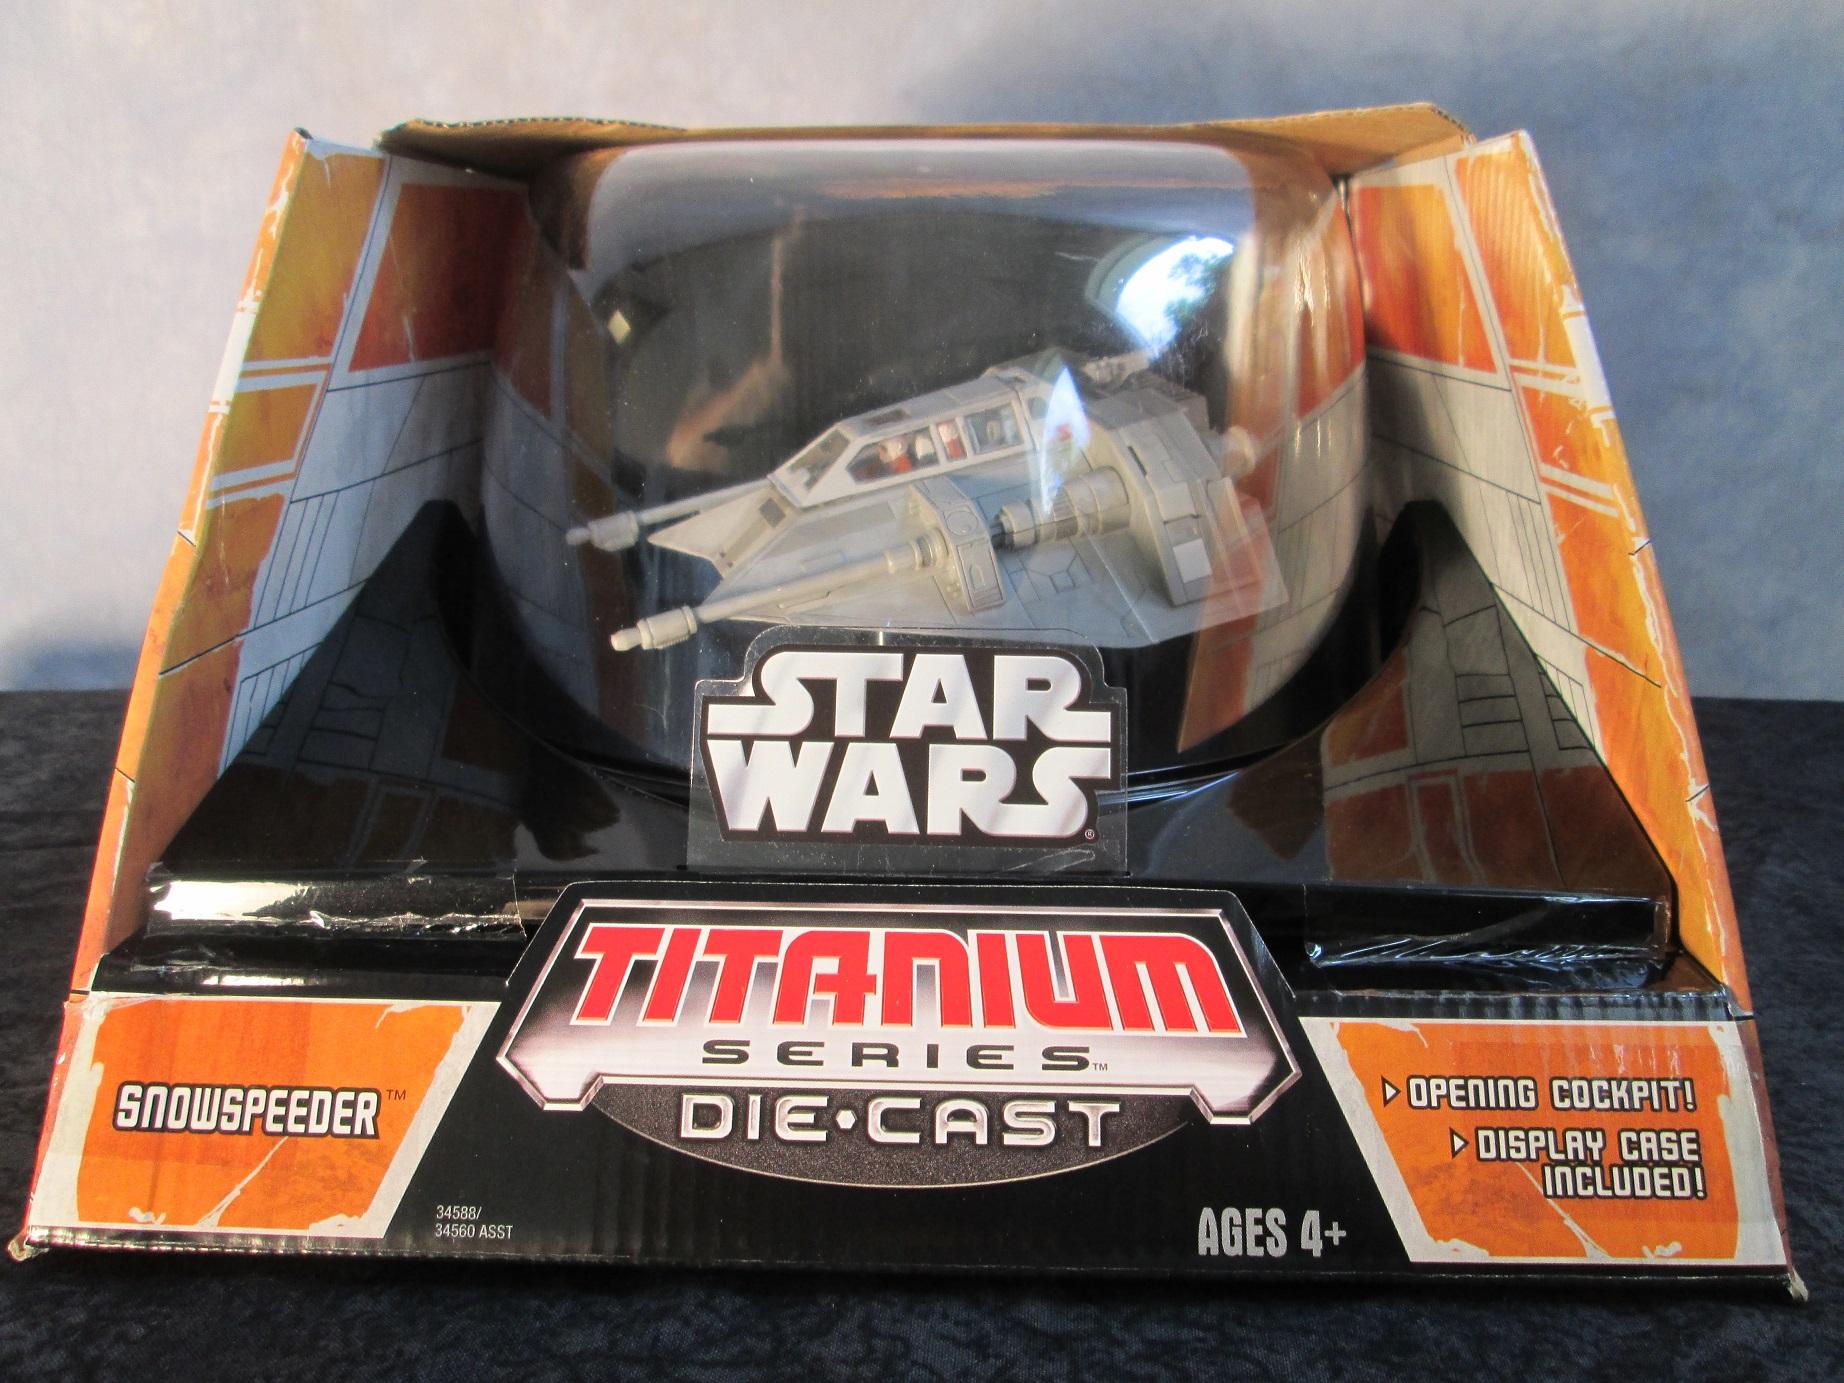 Hasbro Titanium Series Star Wars Ultra Snowspeeder 34588